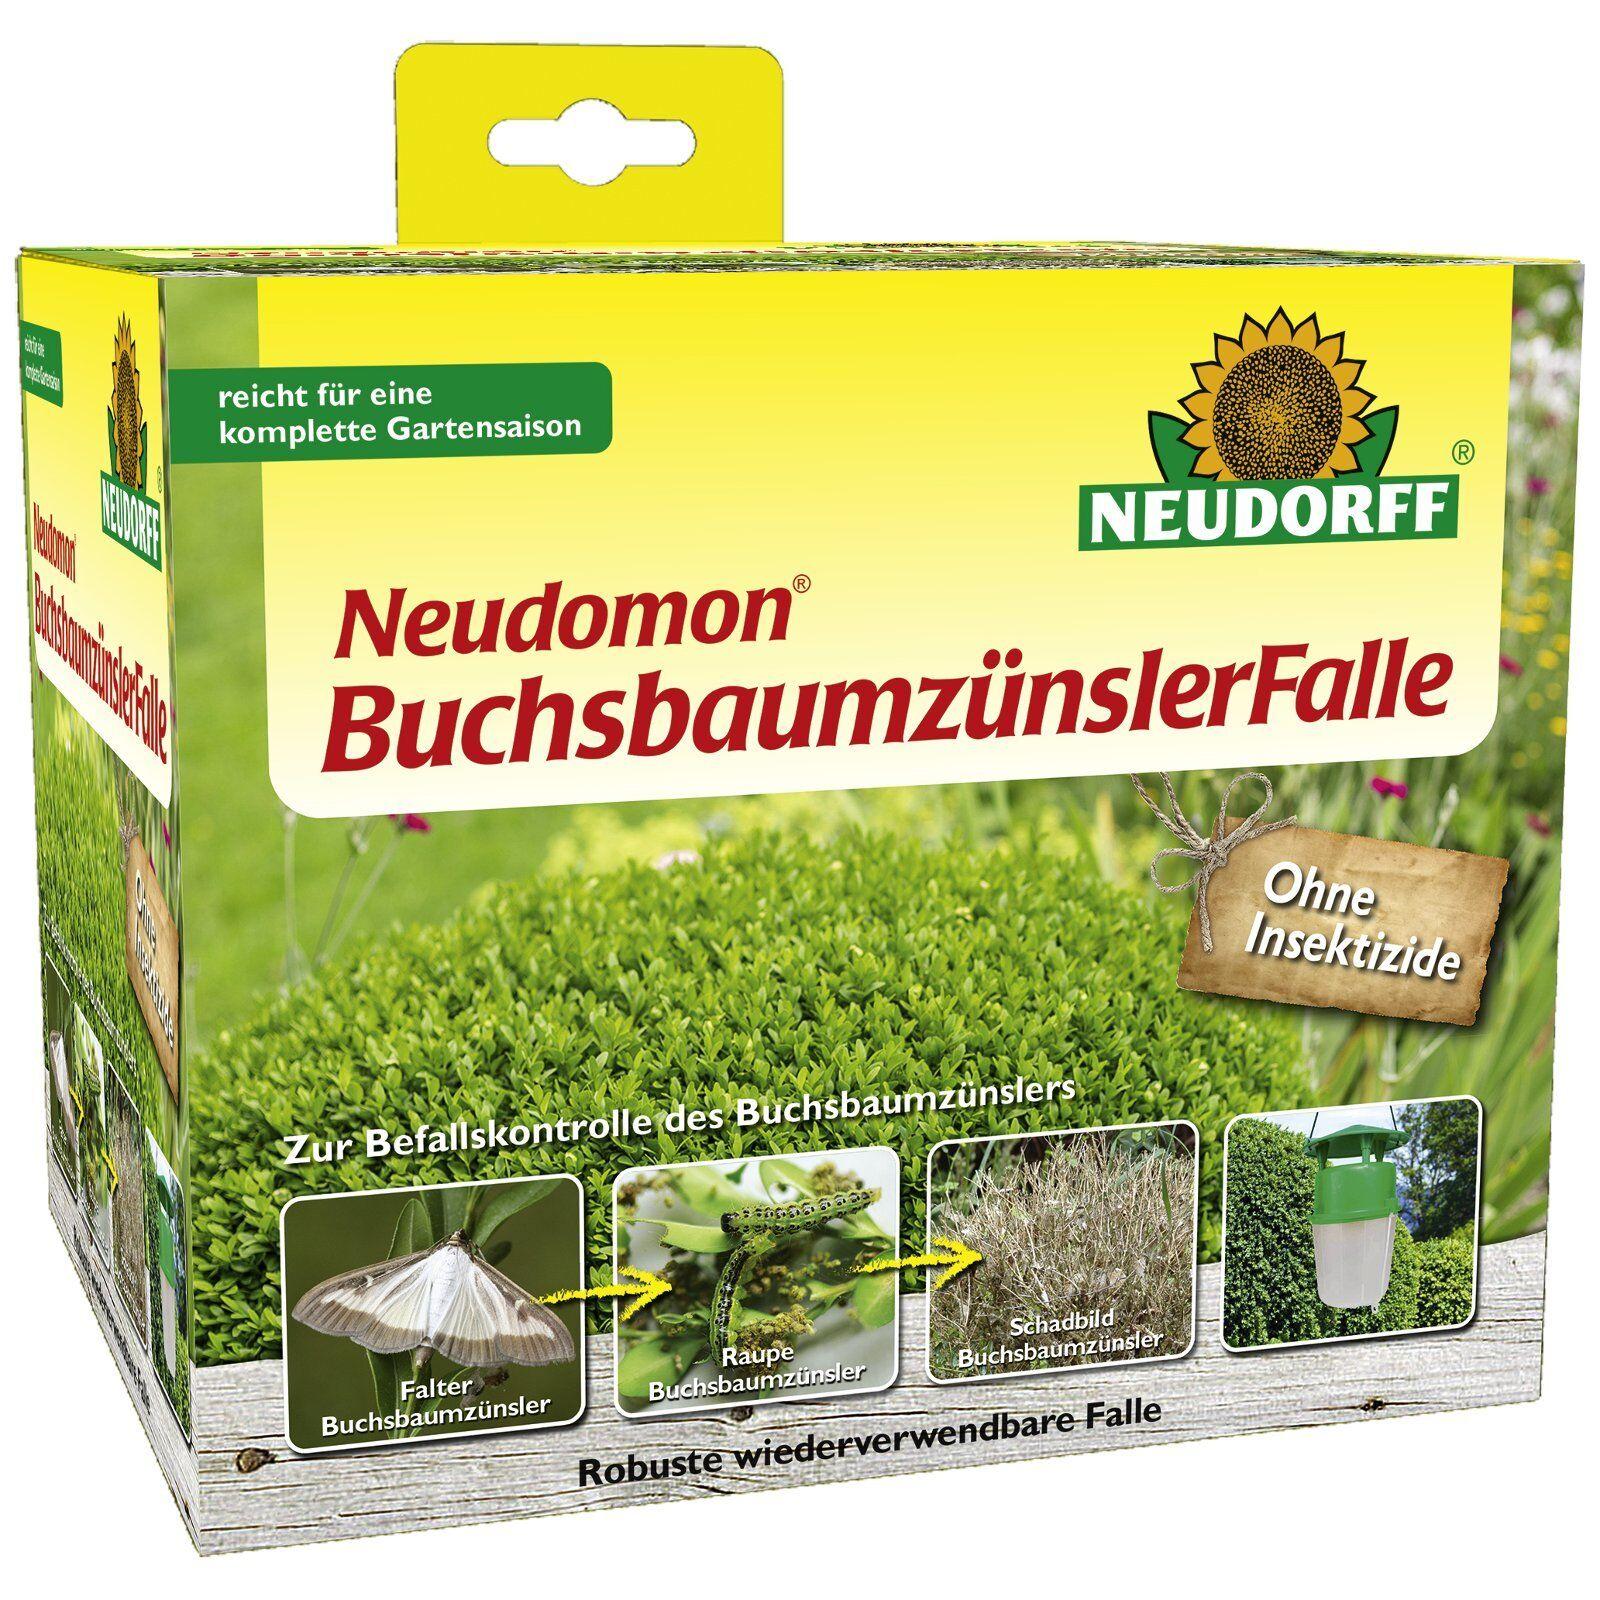 Neudorff Neudomon Buchsbaumzünsler-Falle Pheromonfalle Buchsbaumzünslerfalle